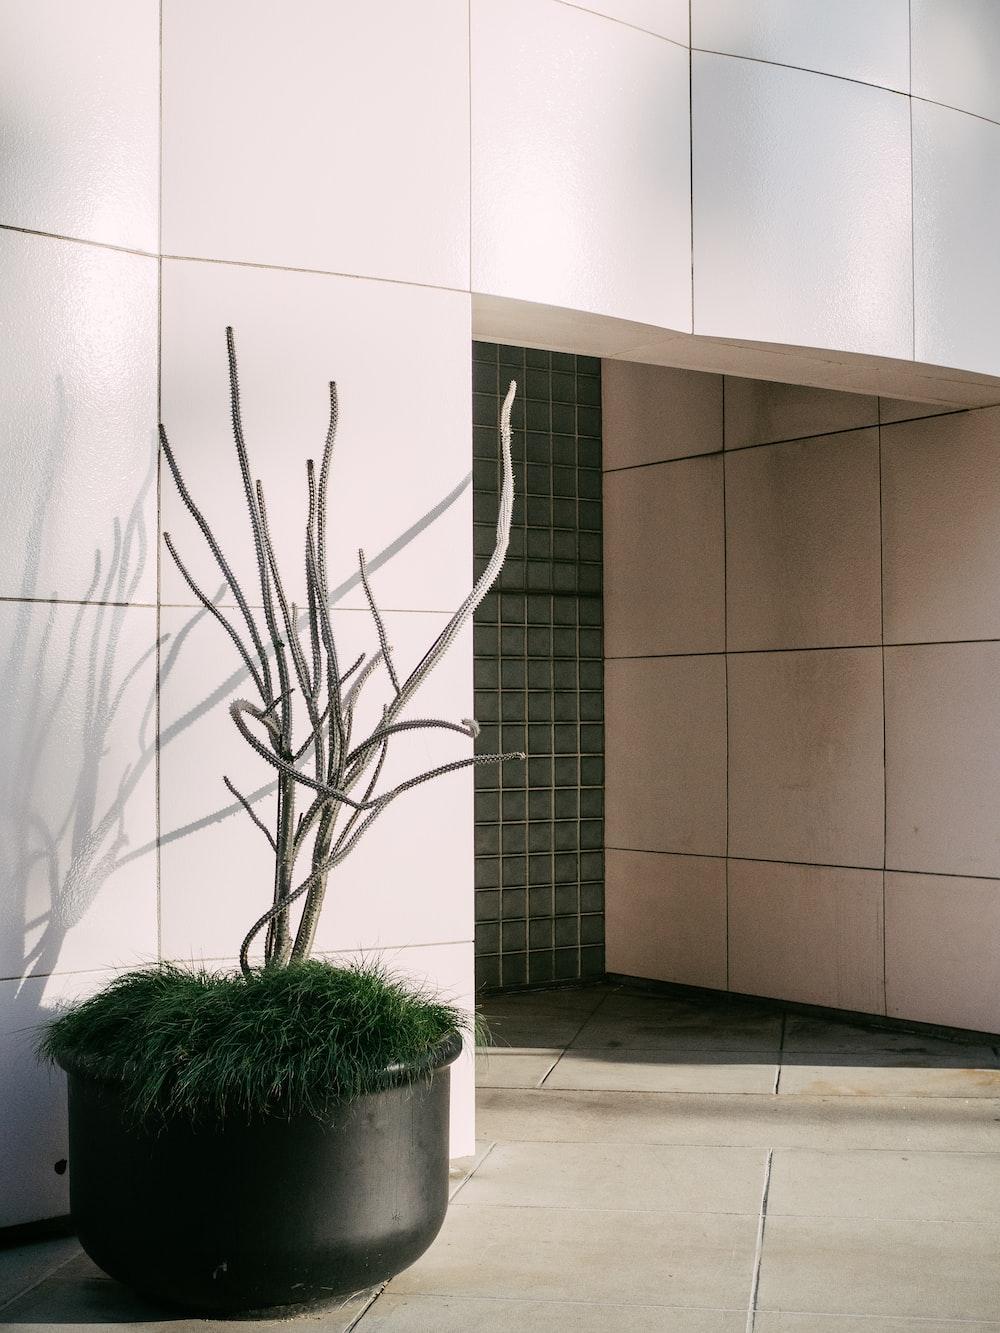 gray plant decor outside building